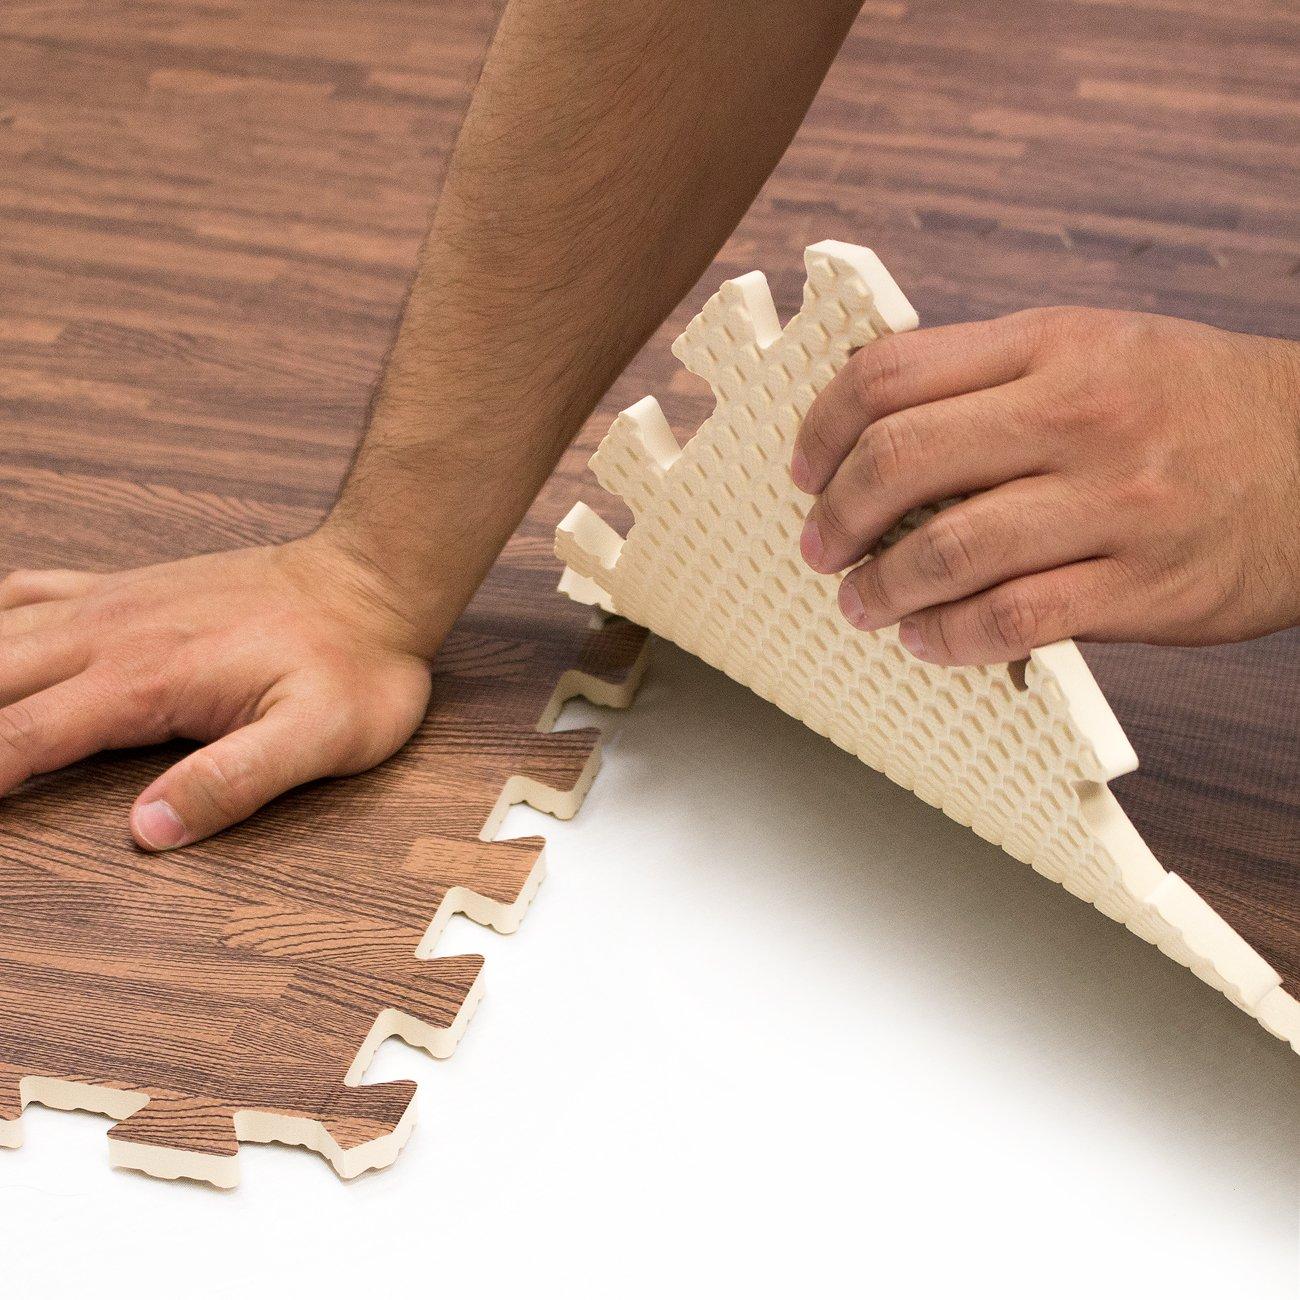 Sorbus Interlocking Floor Mat Print, Wood Grain - Dark (6-Piece) by Sorbus (Image #7)